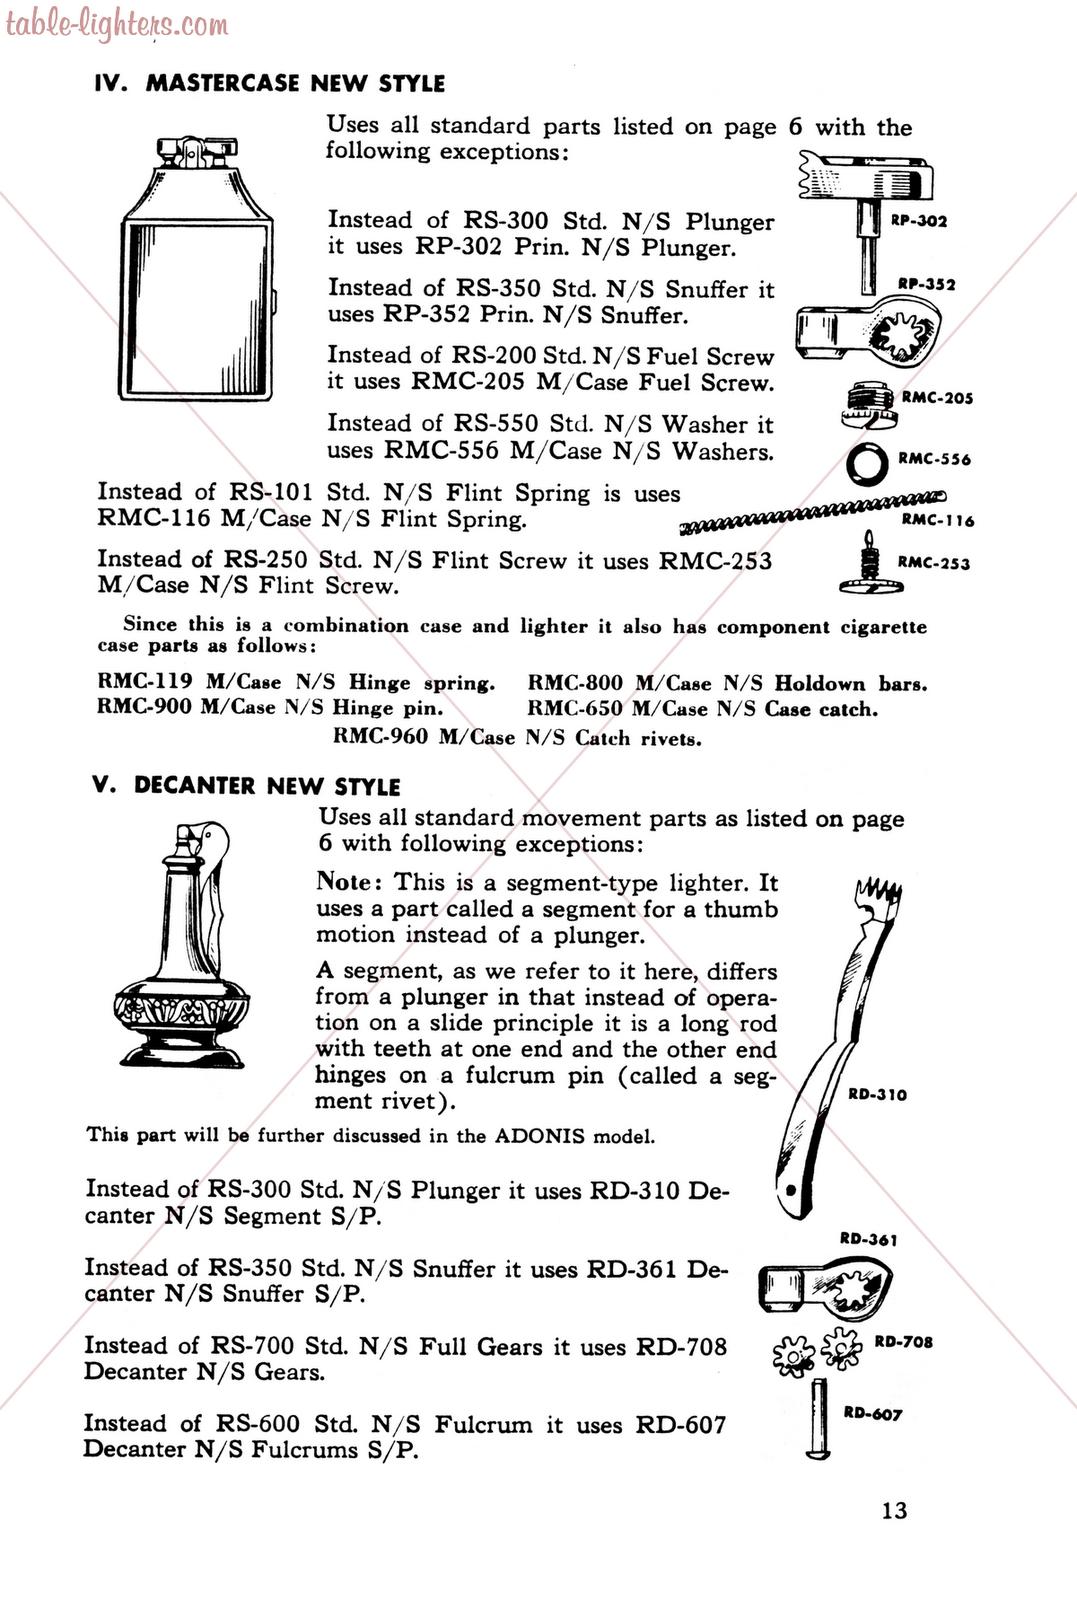 Contempo Butane Collection Manual Guide